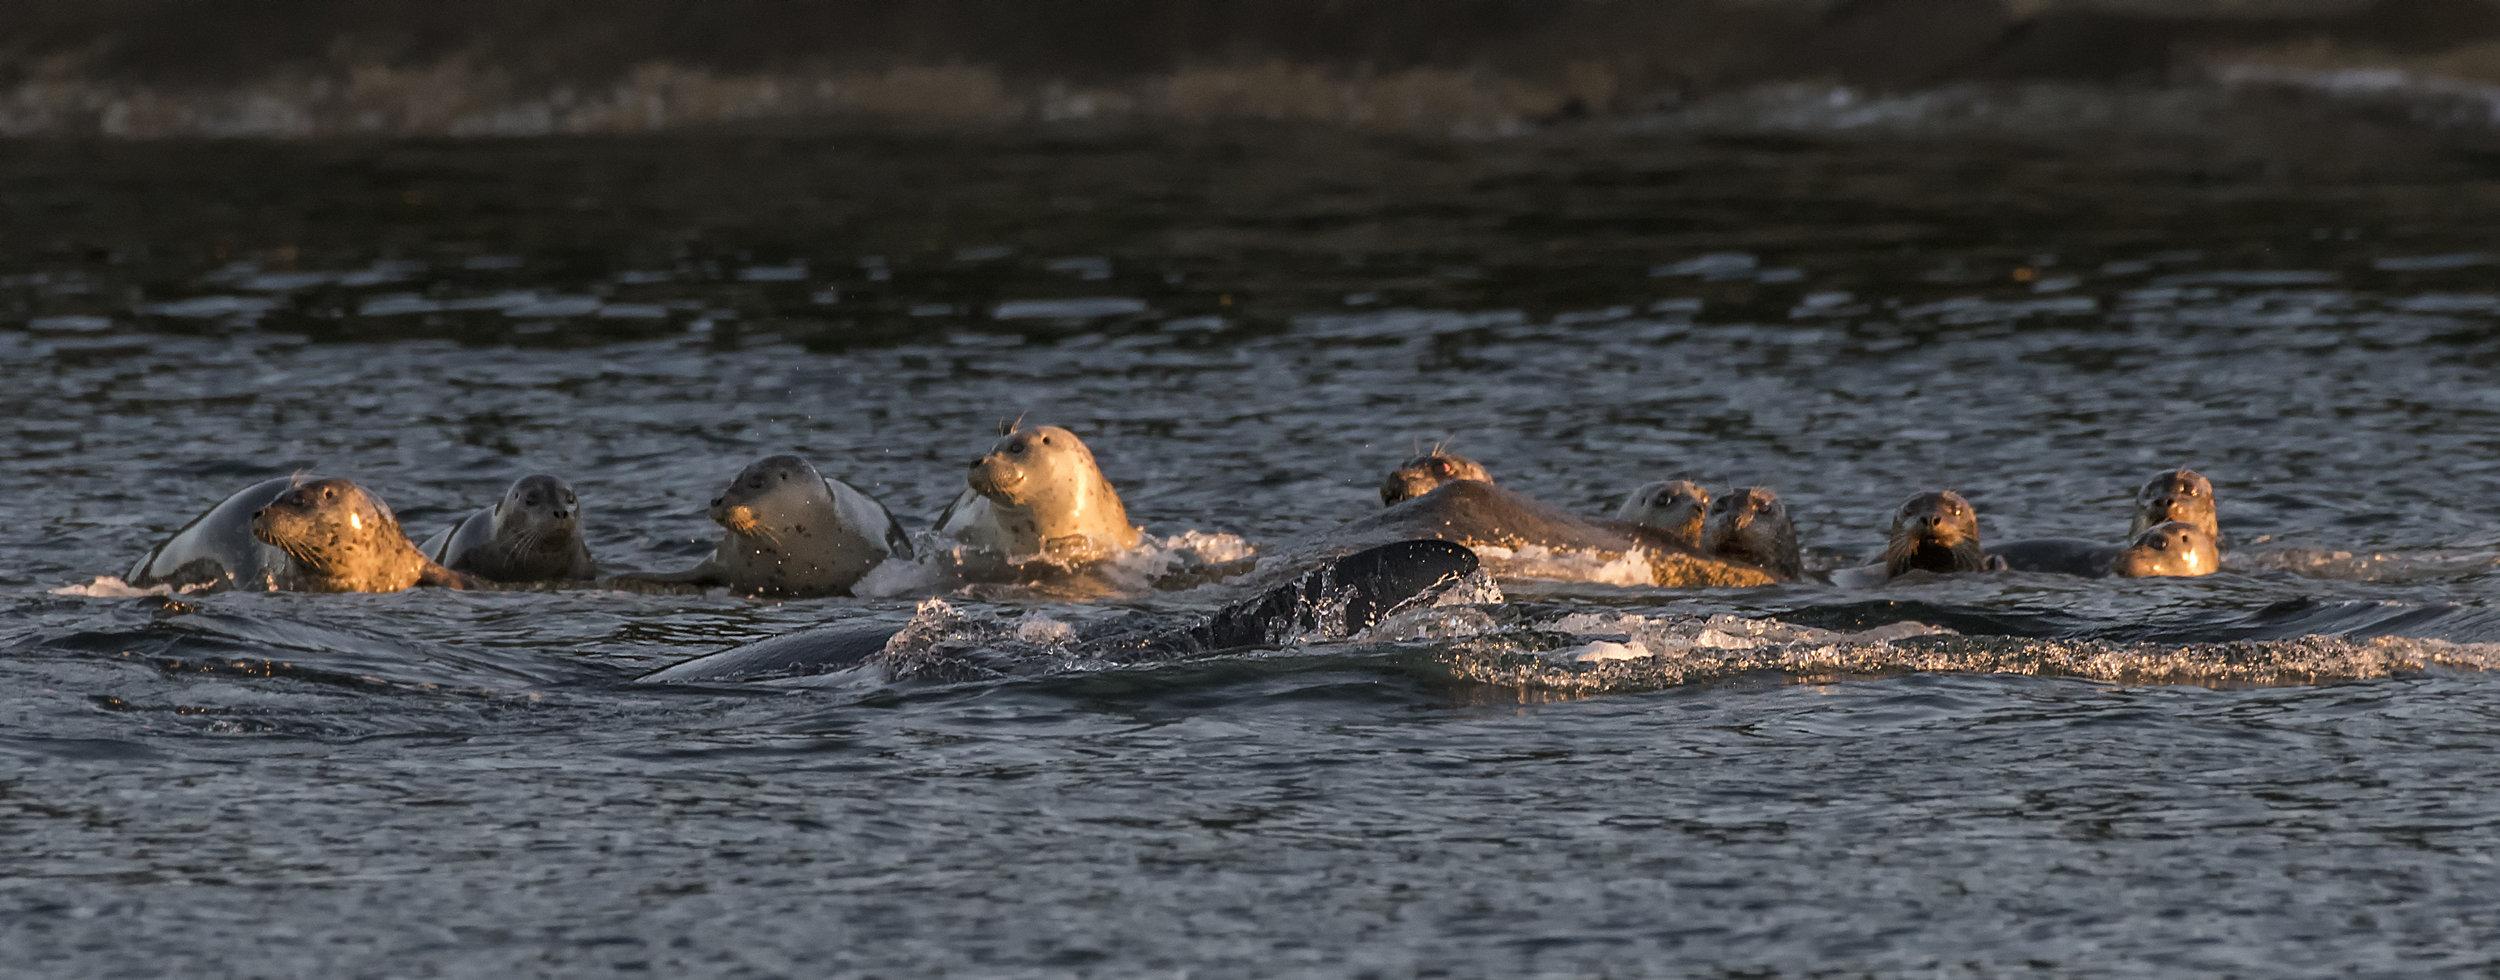 Orca Seal hunt.jpg